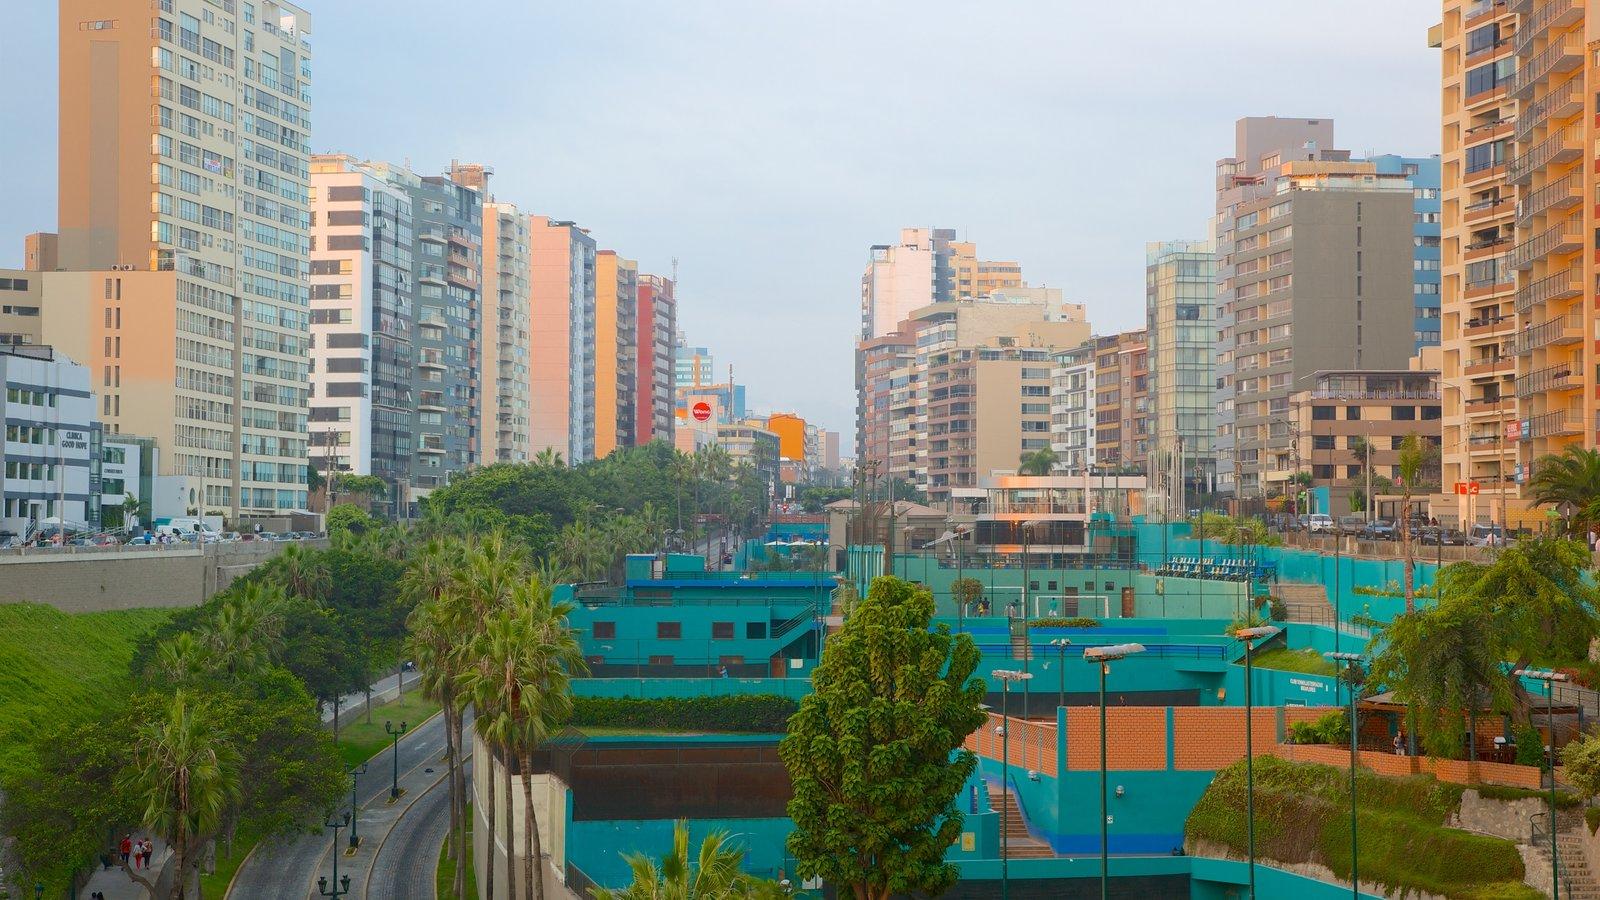 Miraflores que inclui distrito comercial central